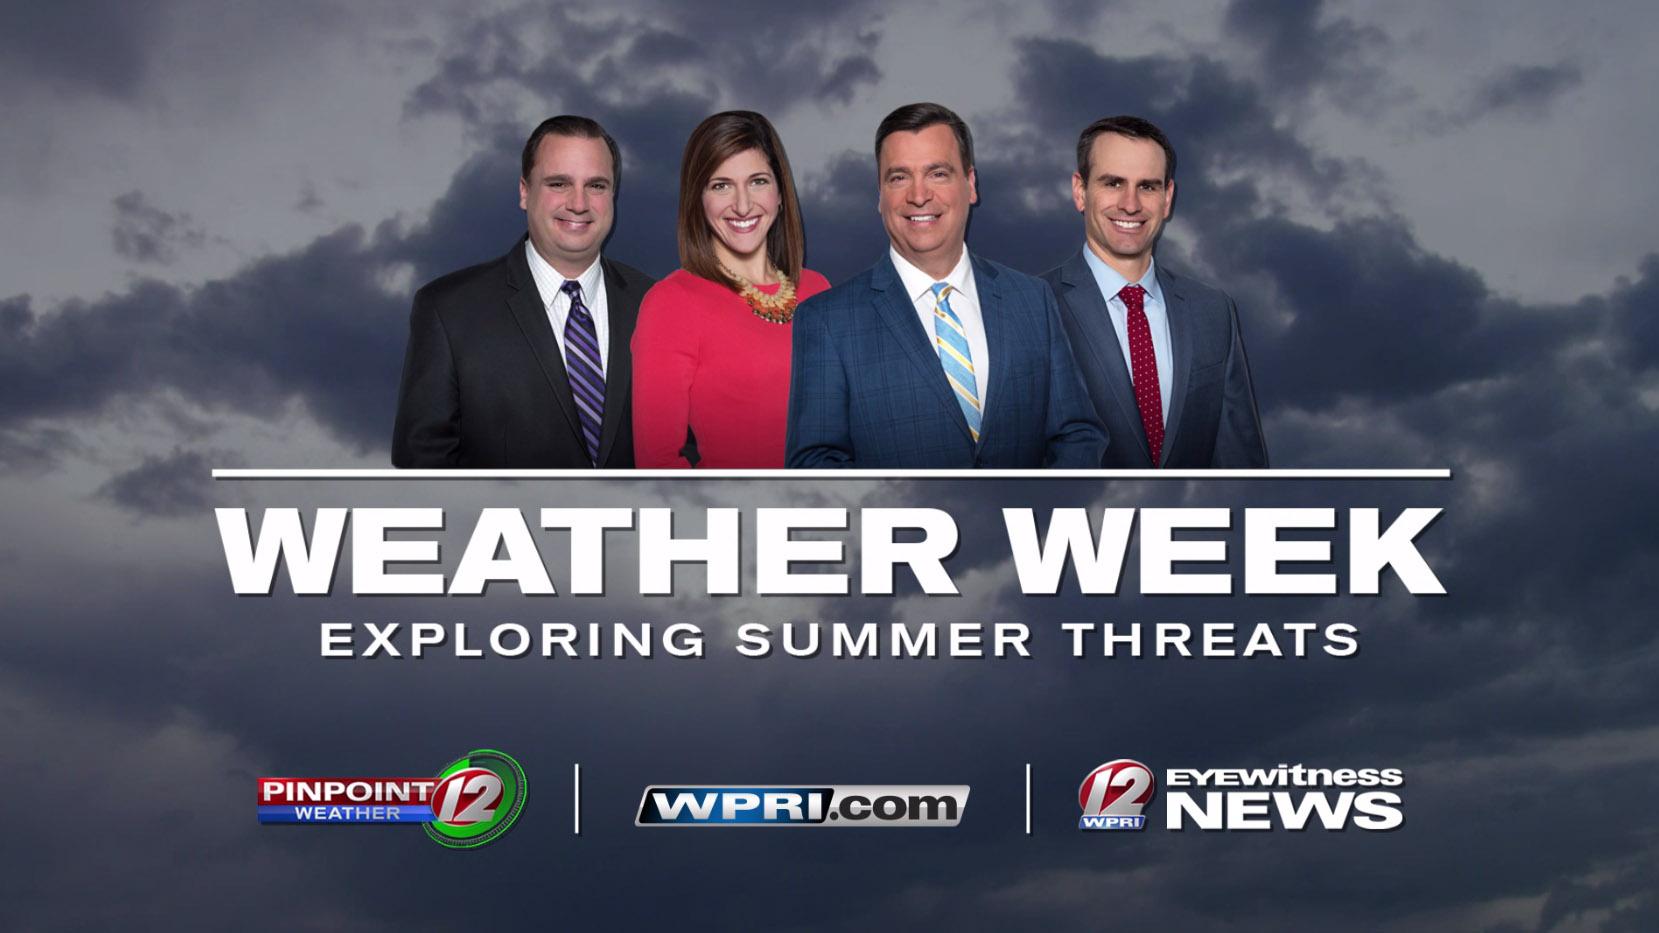 Friday on Weather Week: Lightning Dangers   WPRI com